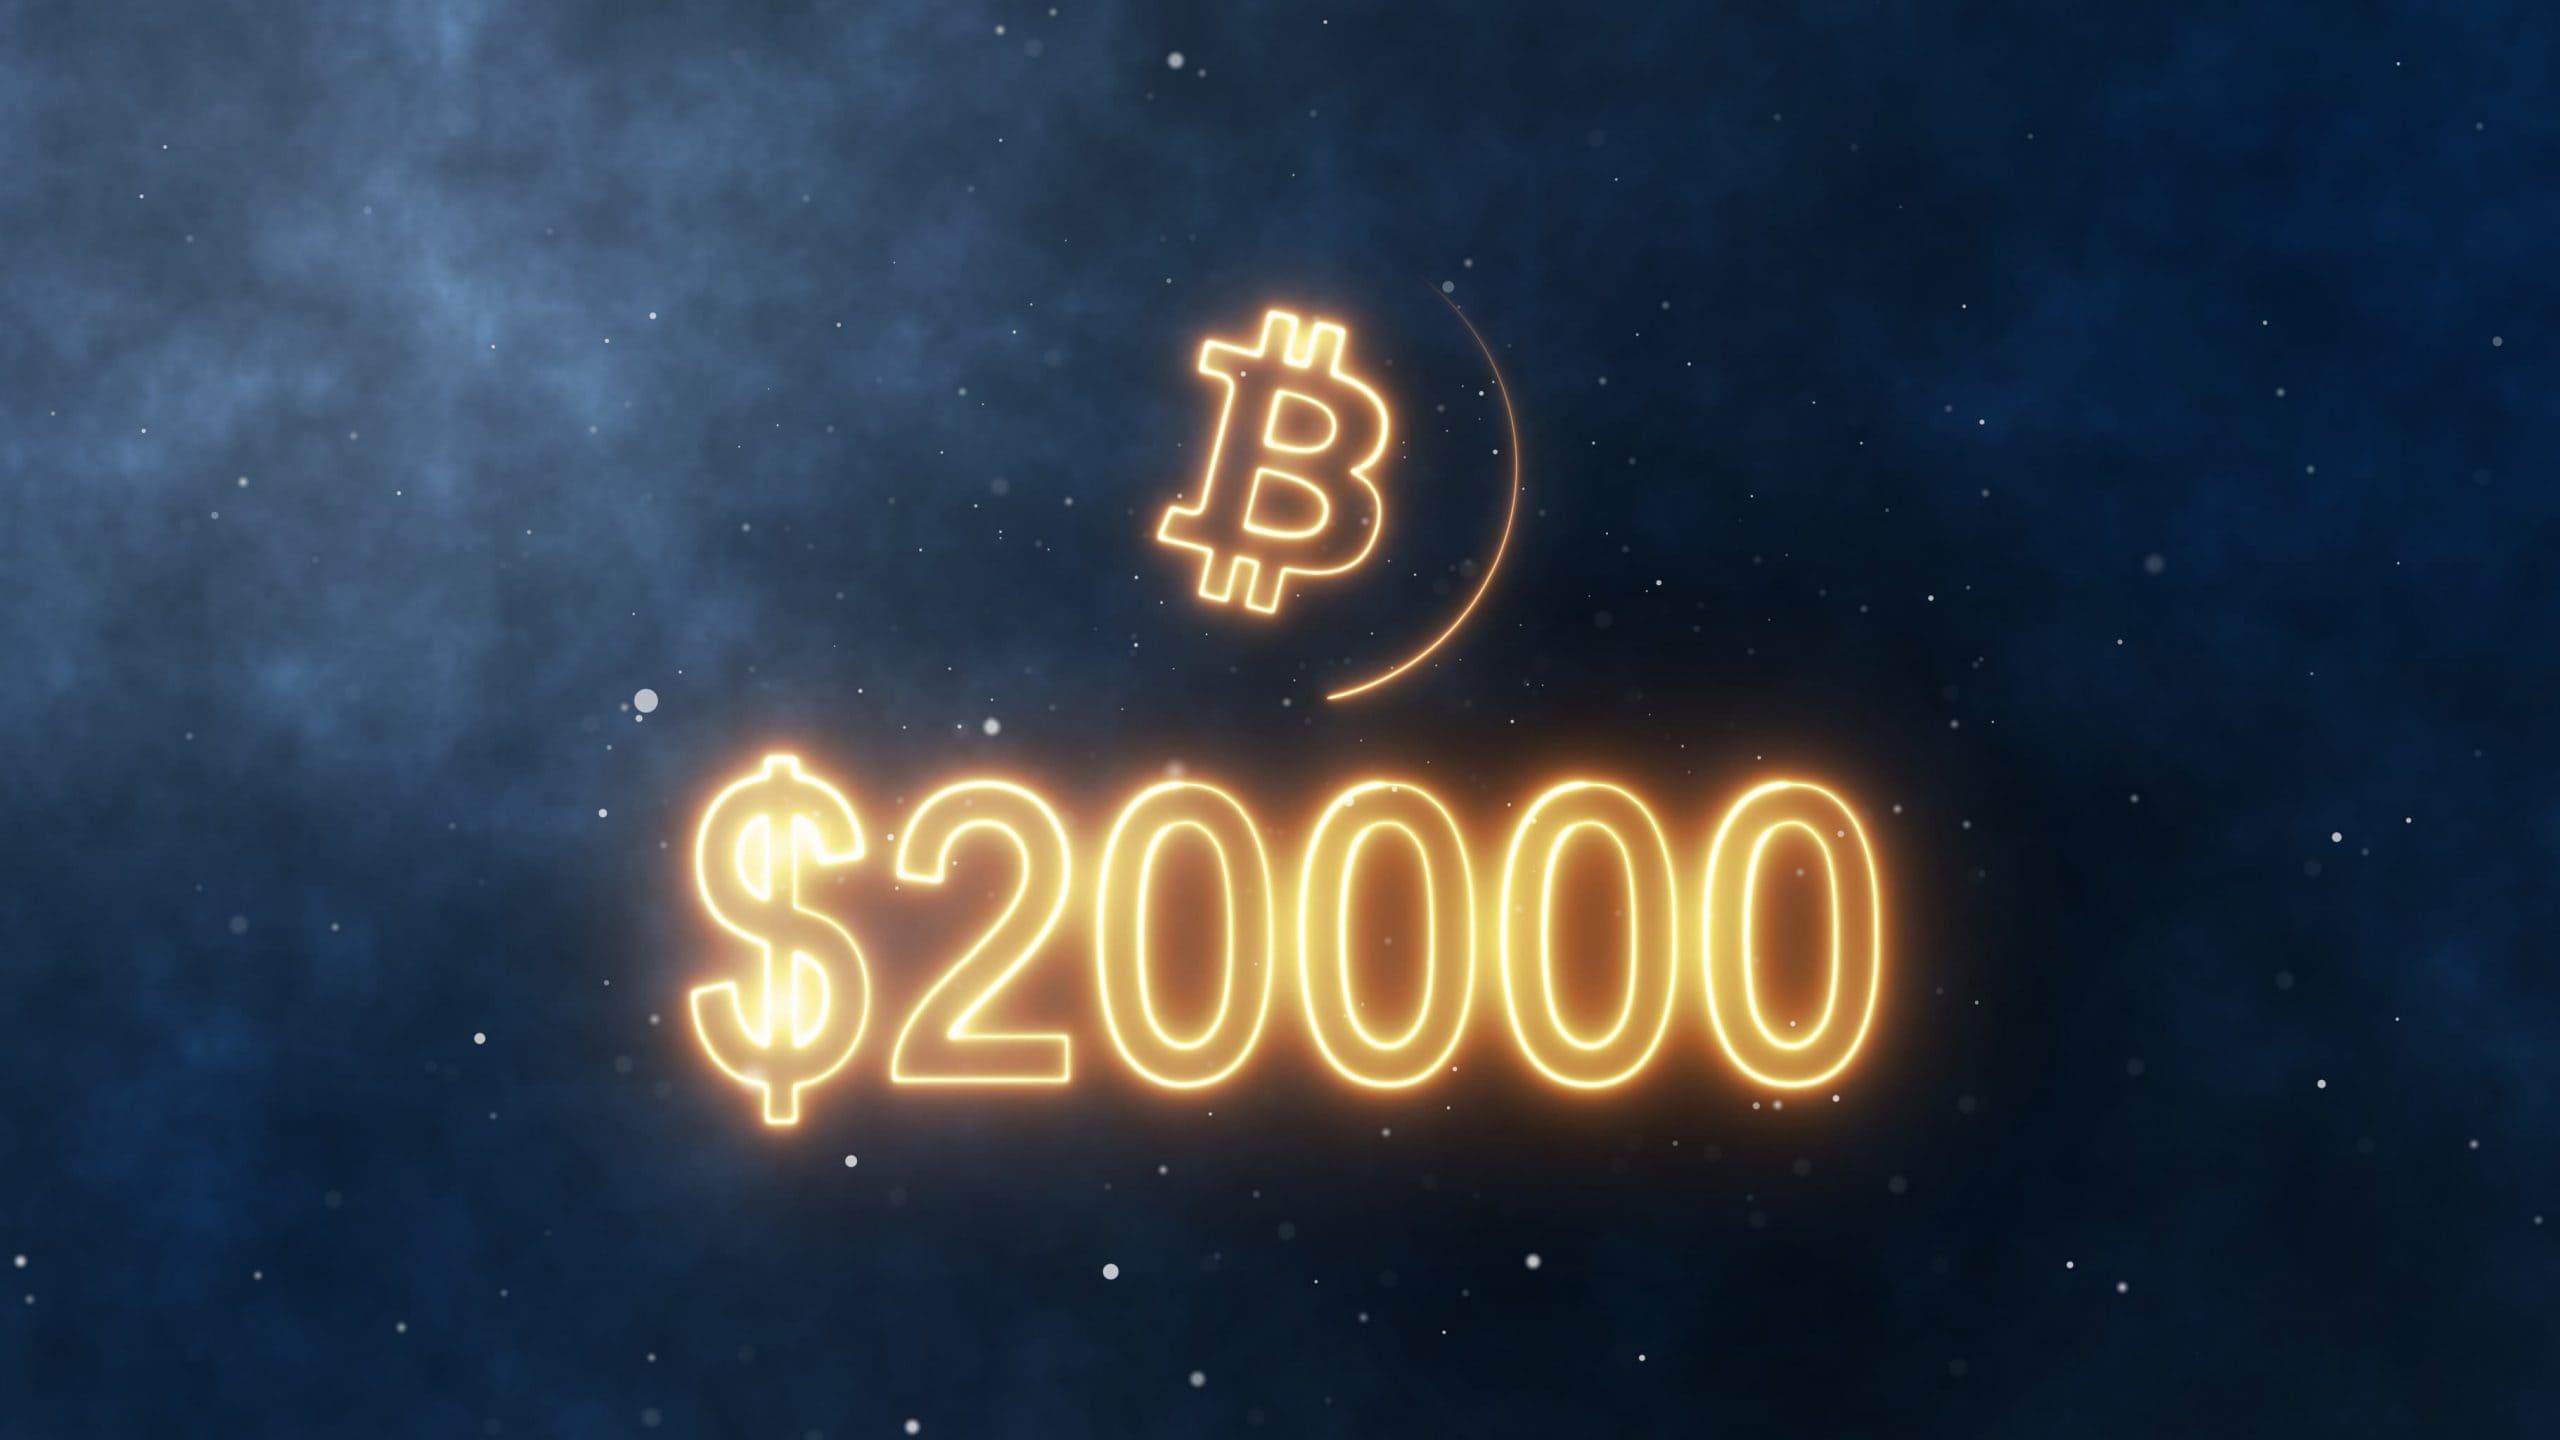 Bitcoin-Symbol, darunter der Schriftzug 20.000 US-Dollar